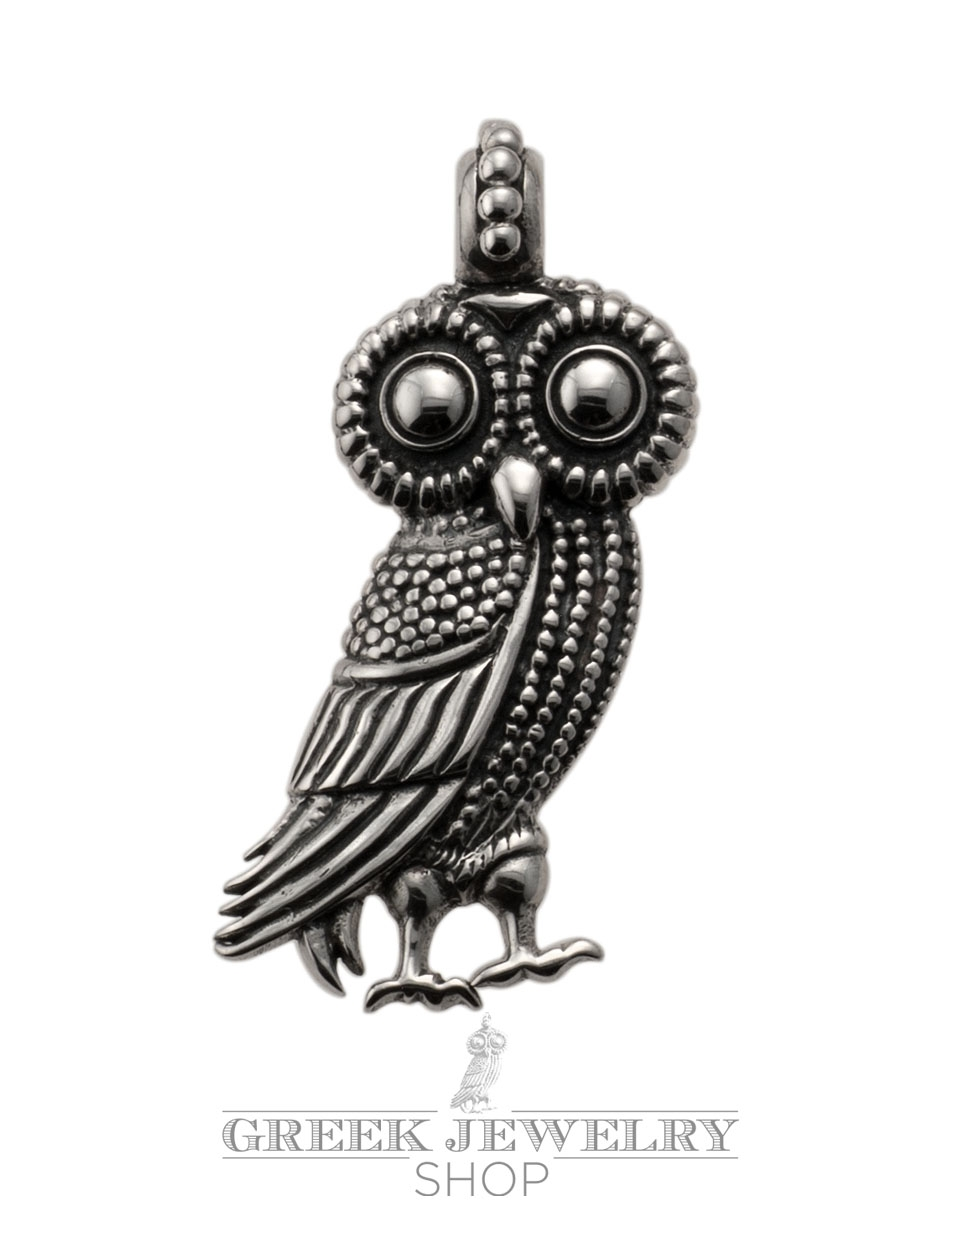 263 Large Athens Wise Owl Pendant